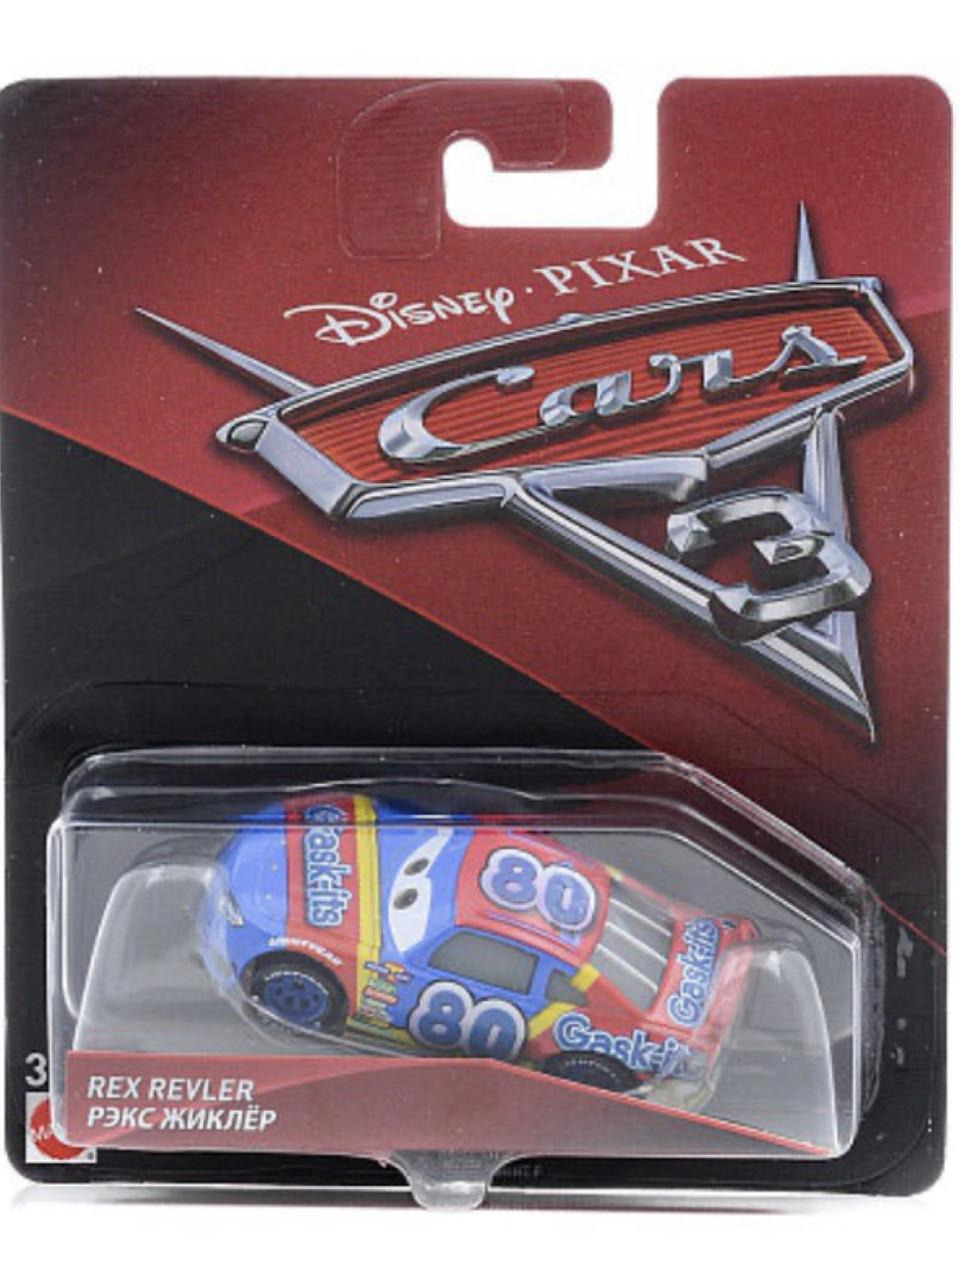 Гонщик 80 з тачок 3 cars 3 Mattel